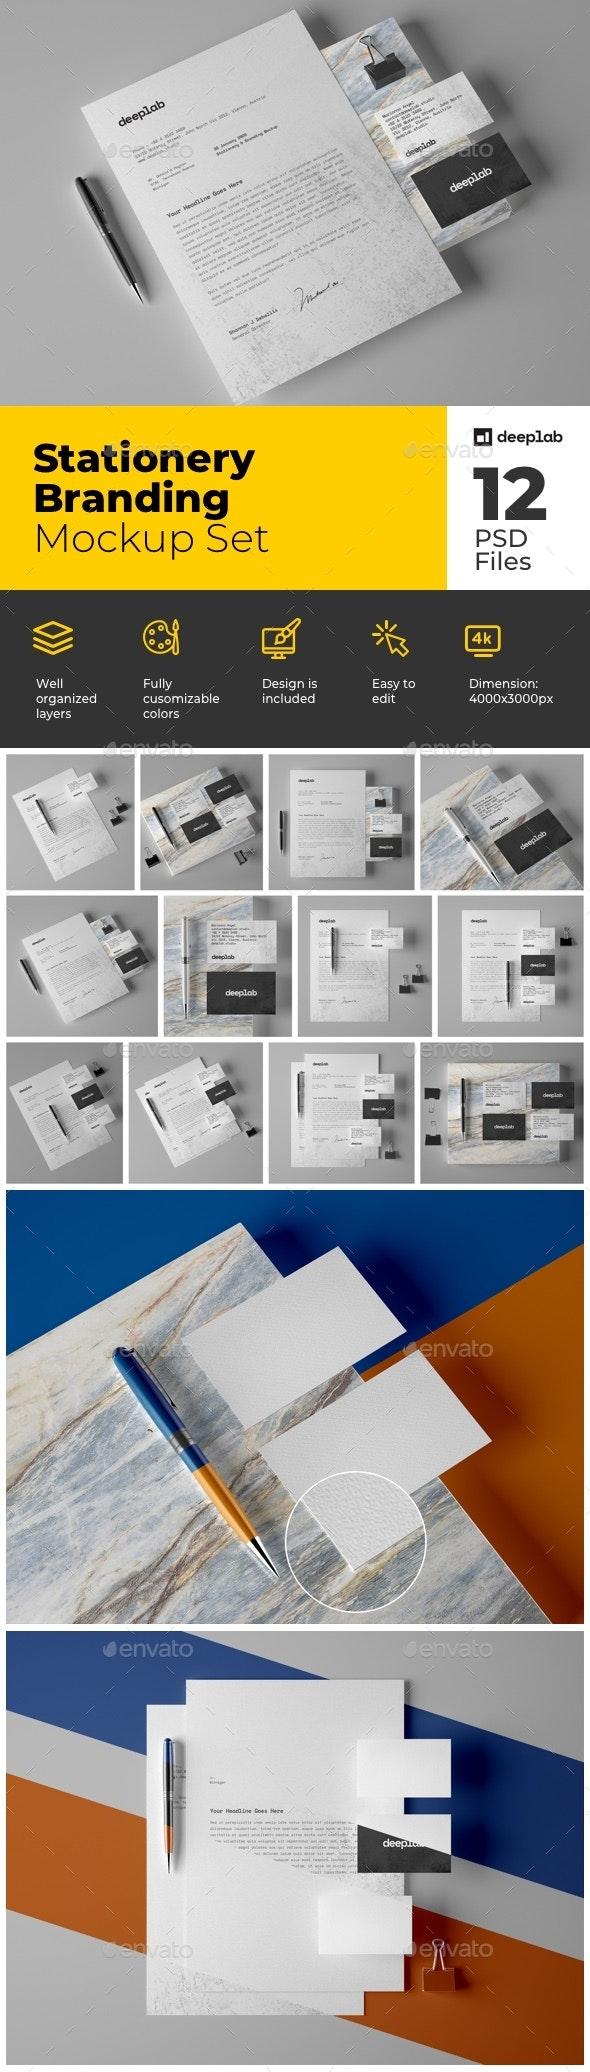 Stationery Branding Mockup Set - Product Mock-Ups Graphics